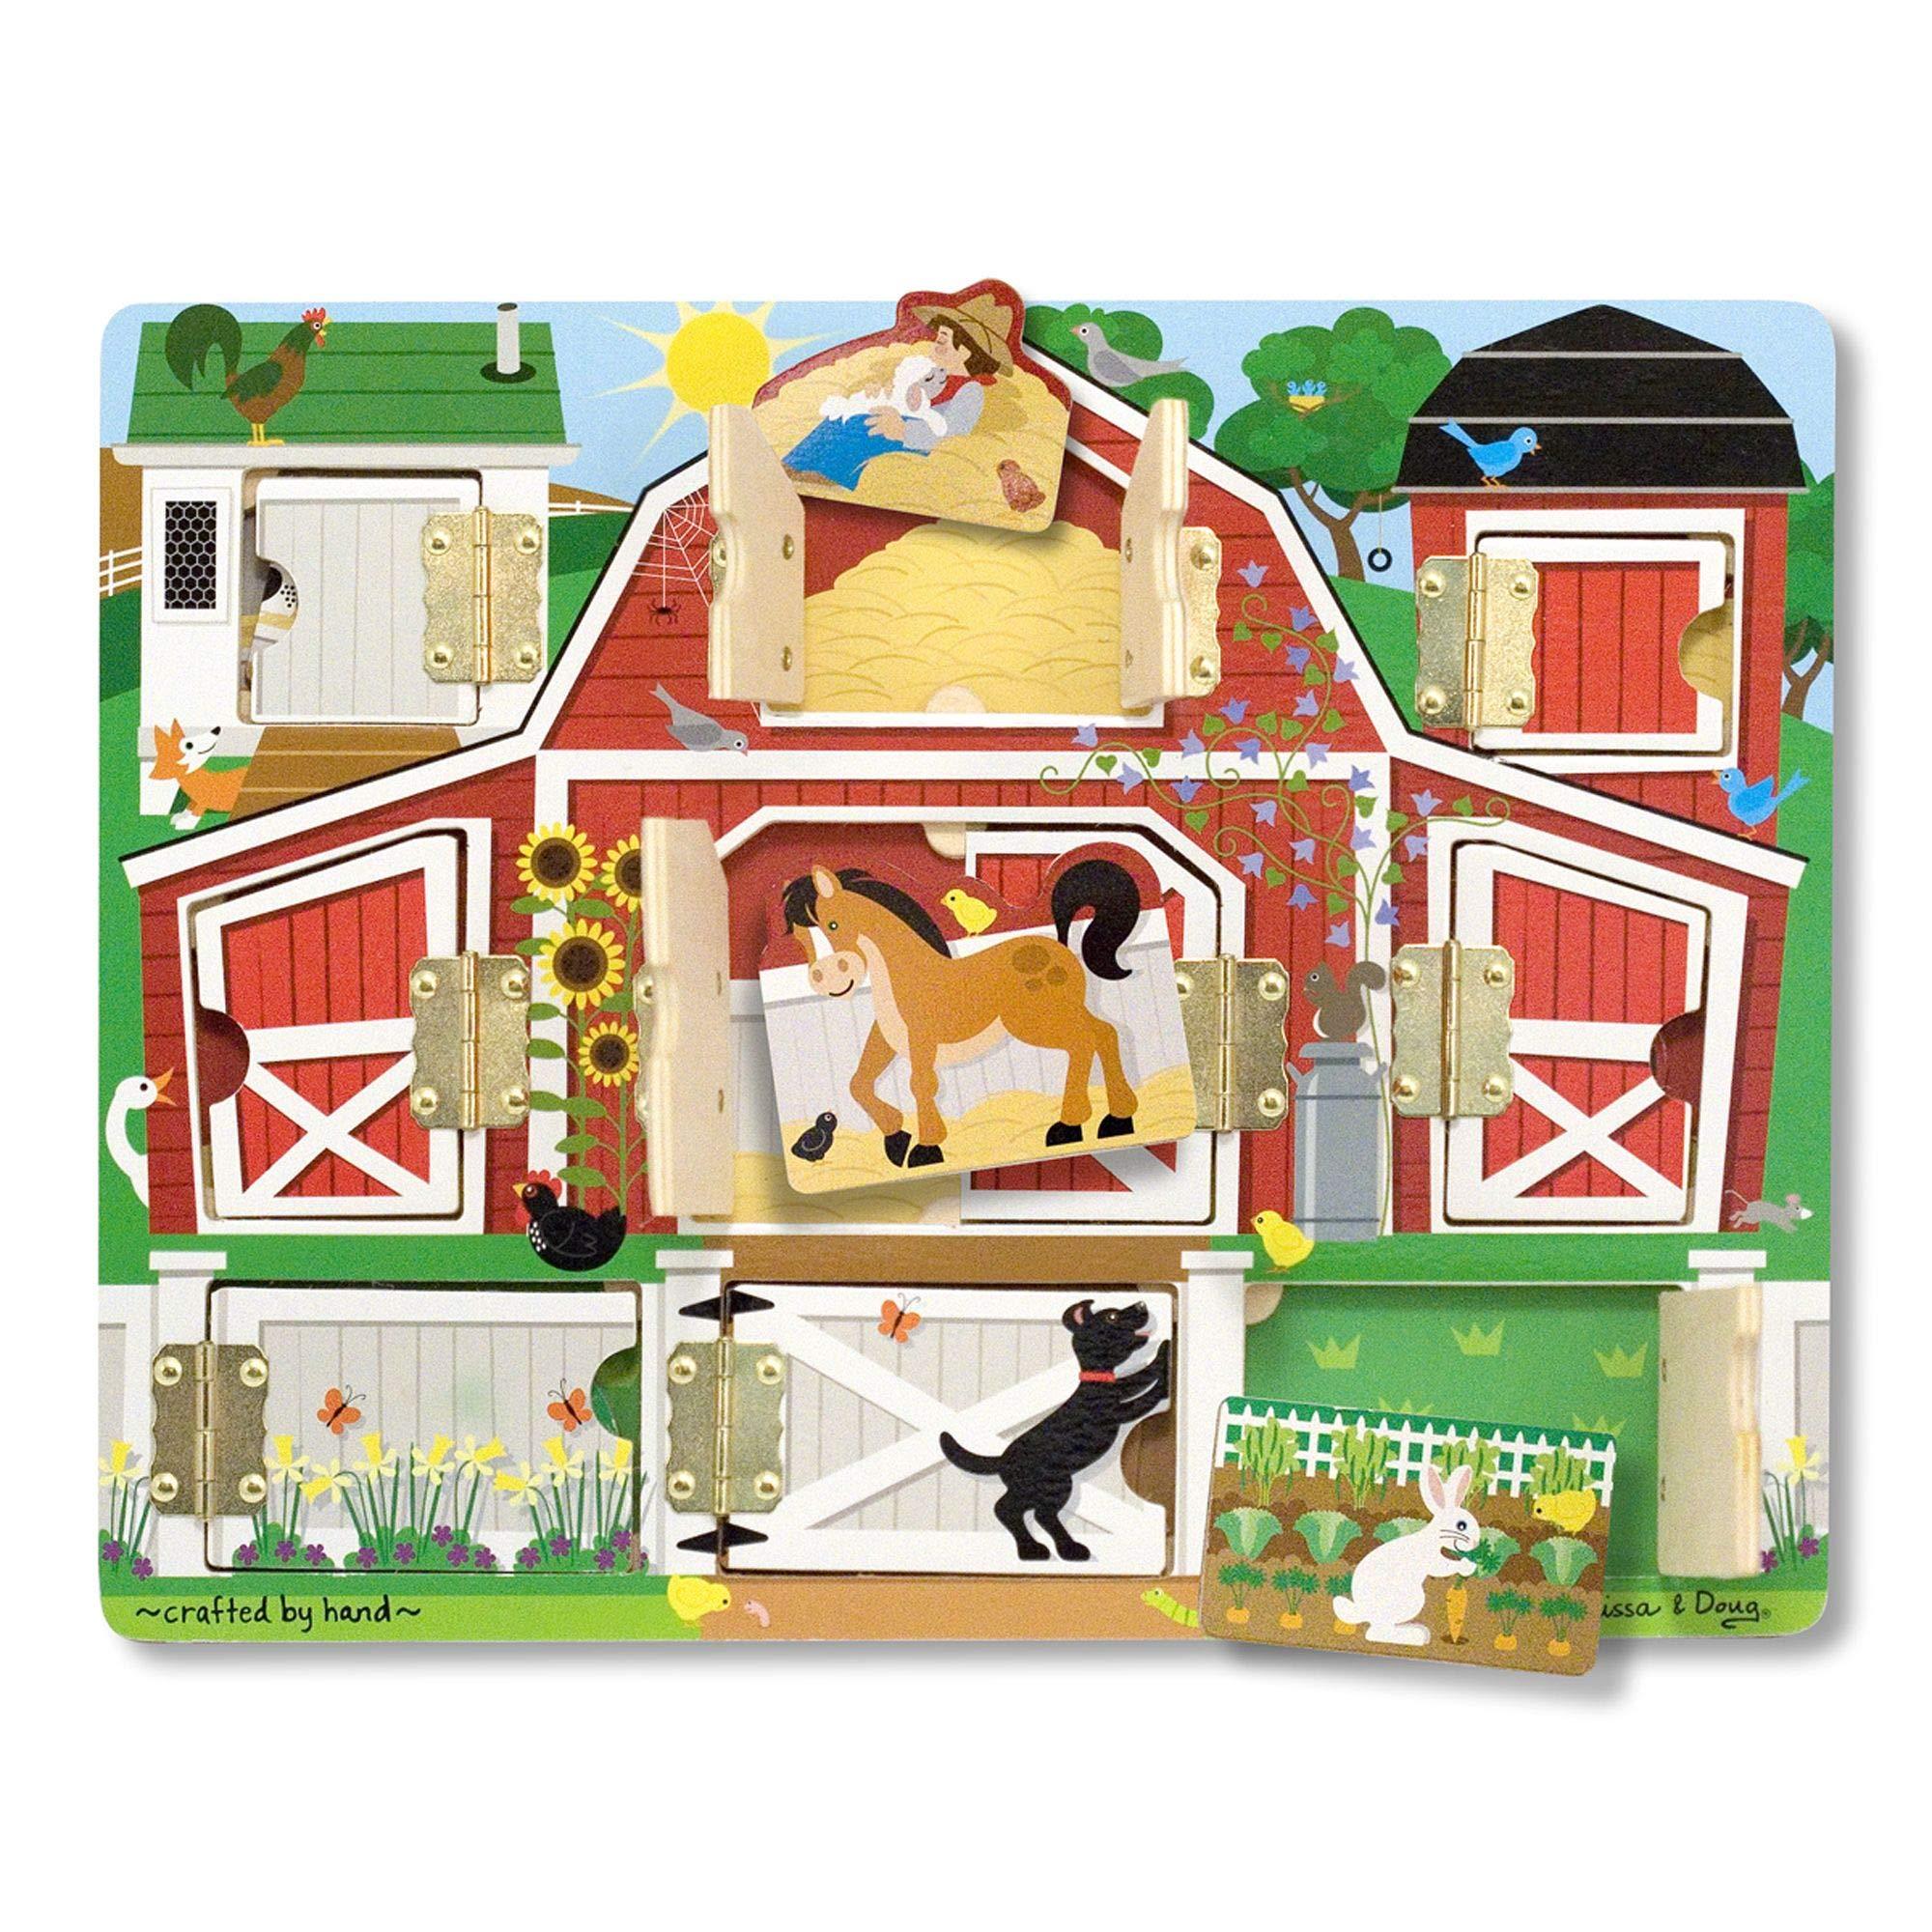 "Melissa & Doug Hide & Seek Farm (Developmental Toys, Magnetic Puzzle Board, Sturdy Wooden Construction, 9 Pieces, 12"" H x 9.4"" W x 0.9"" L)"